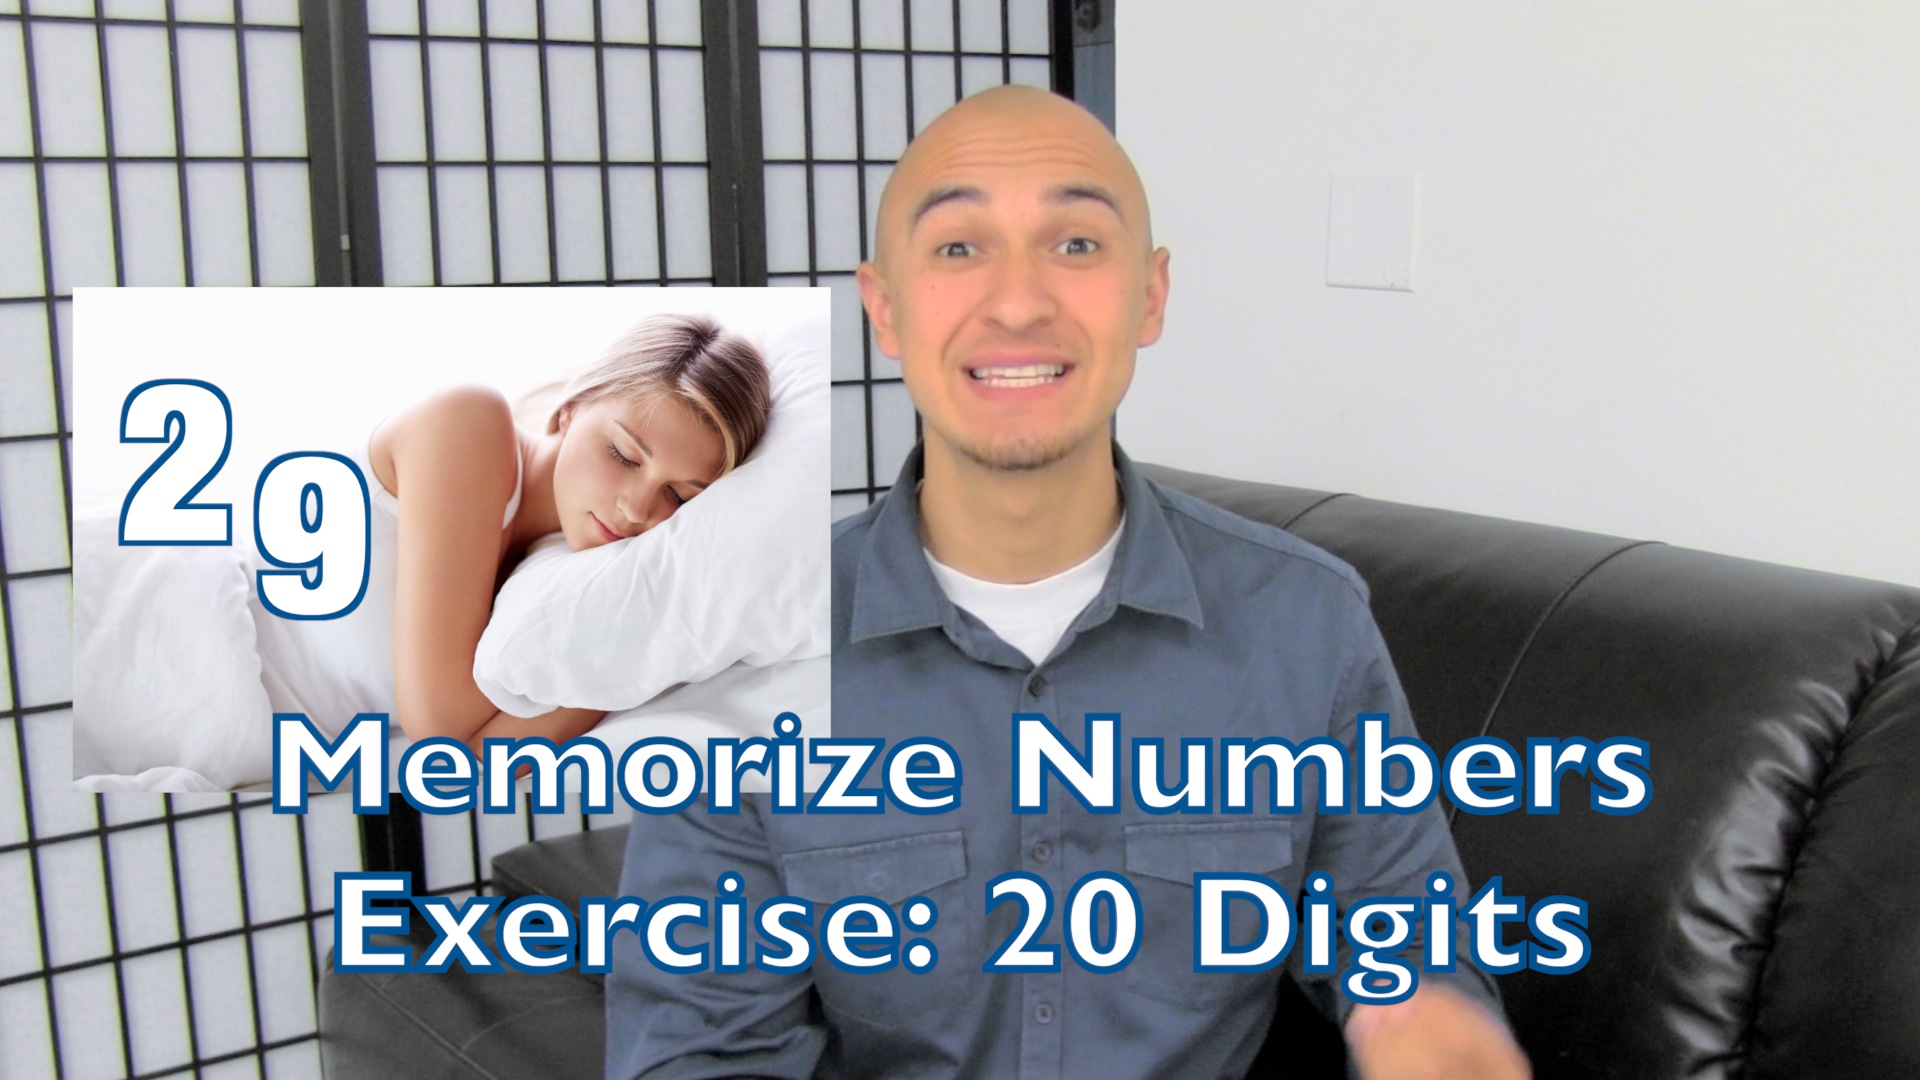 تمرین تقویت حافظه (حفظ اعداد )